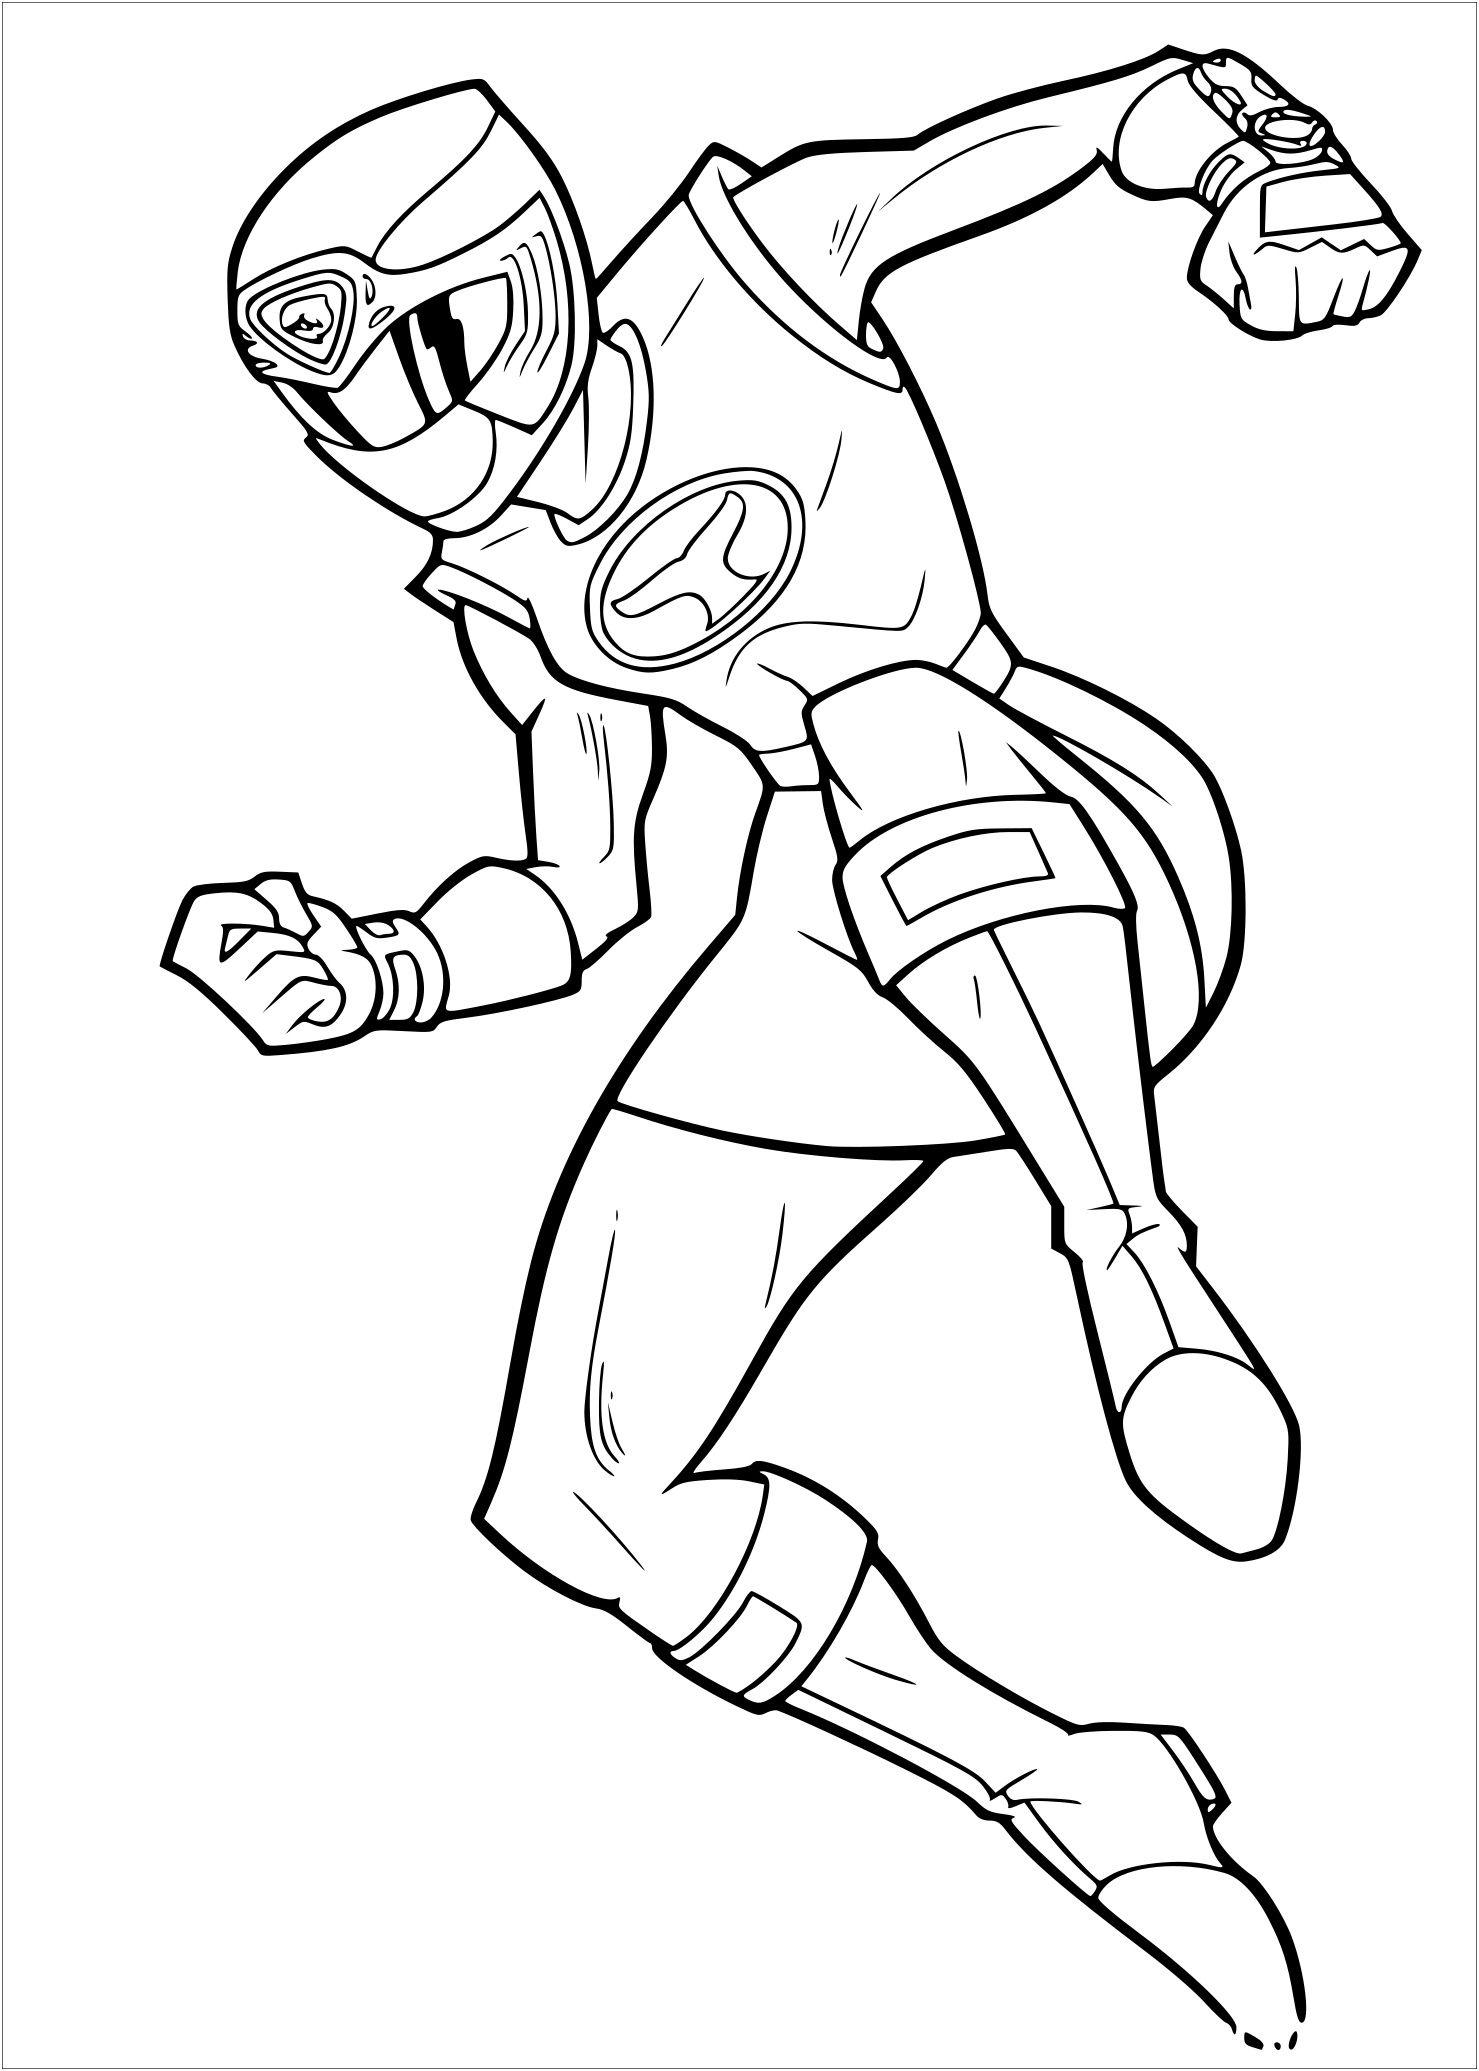 11 Prodigue Coloriage Power Rangers Jungle Fury Image Power Rangers Coloring Pages Power Ranger Coloring Pages Superhero Coloring Pages